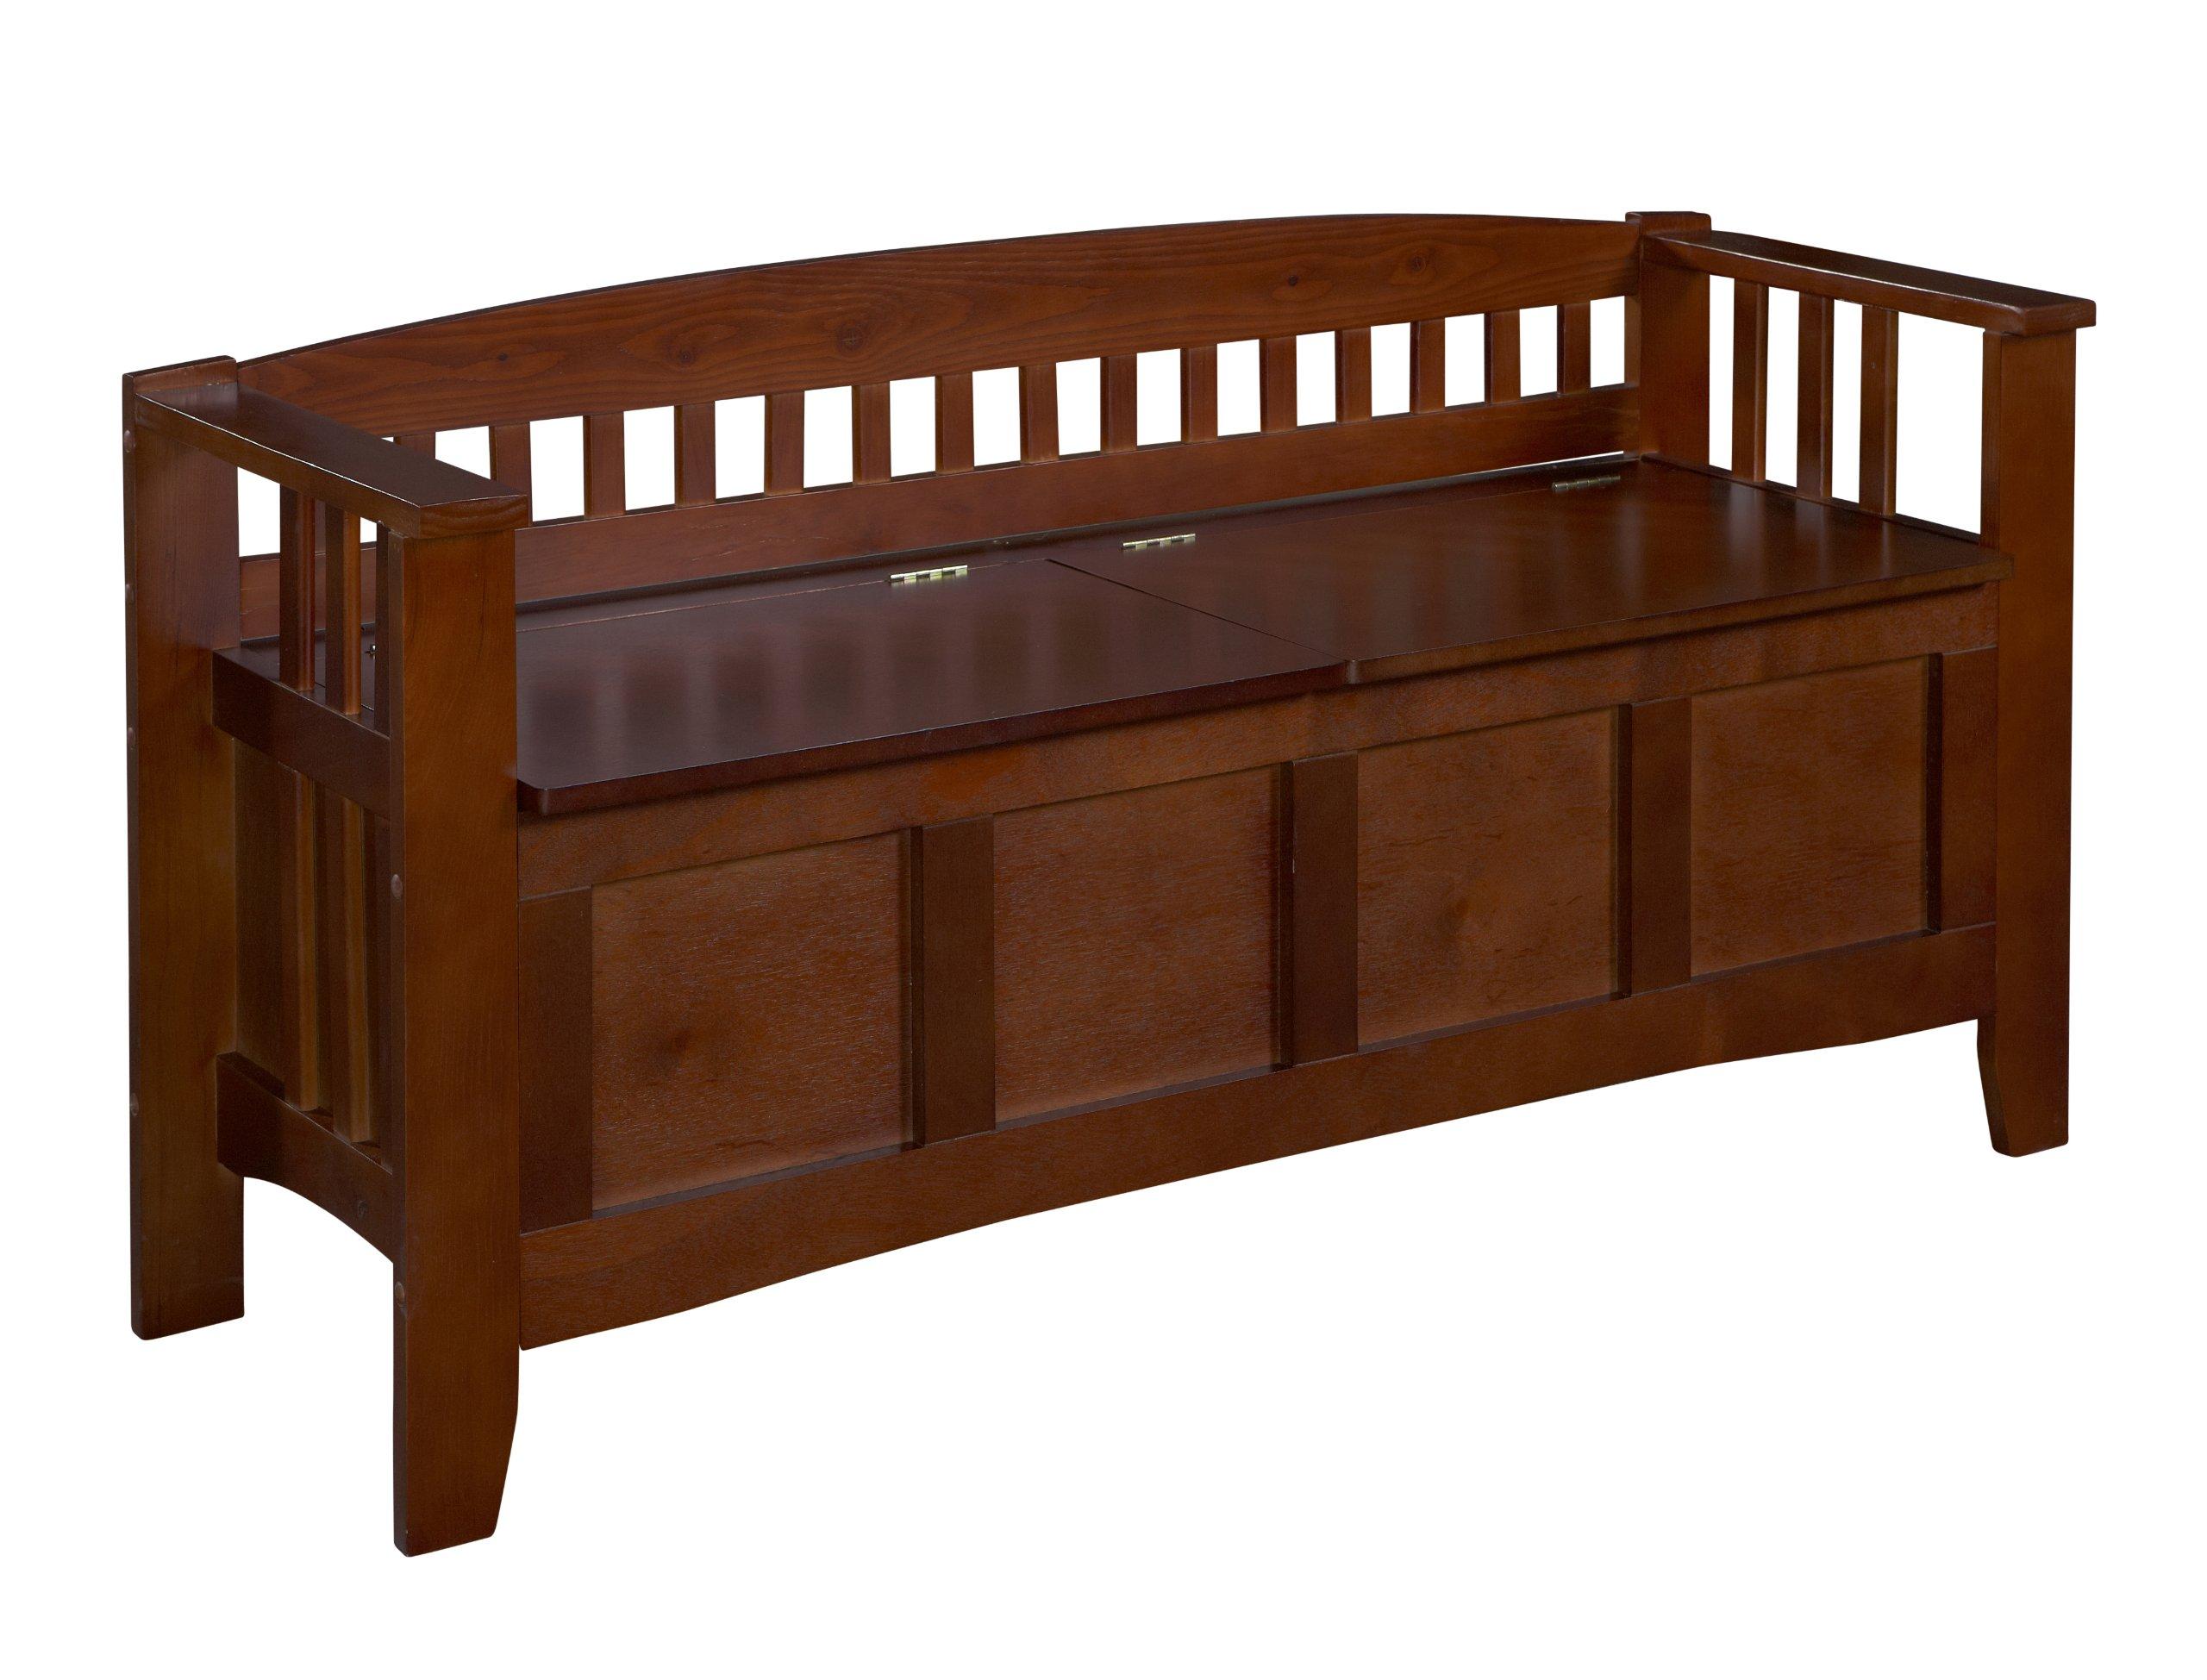 Linon Home Decor Storage Bench with Short Split Seat Storage, Walnut by Linon Home Dcor